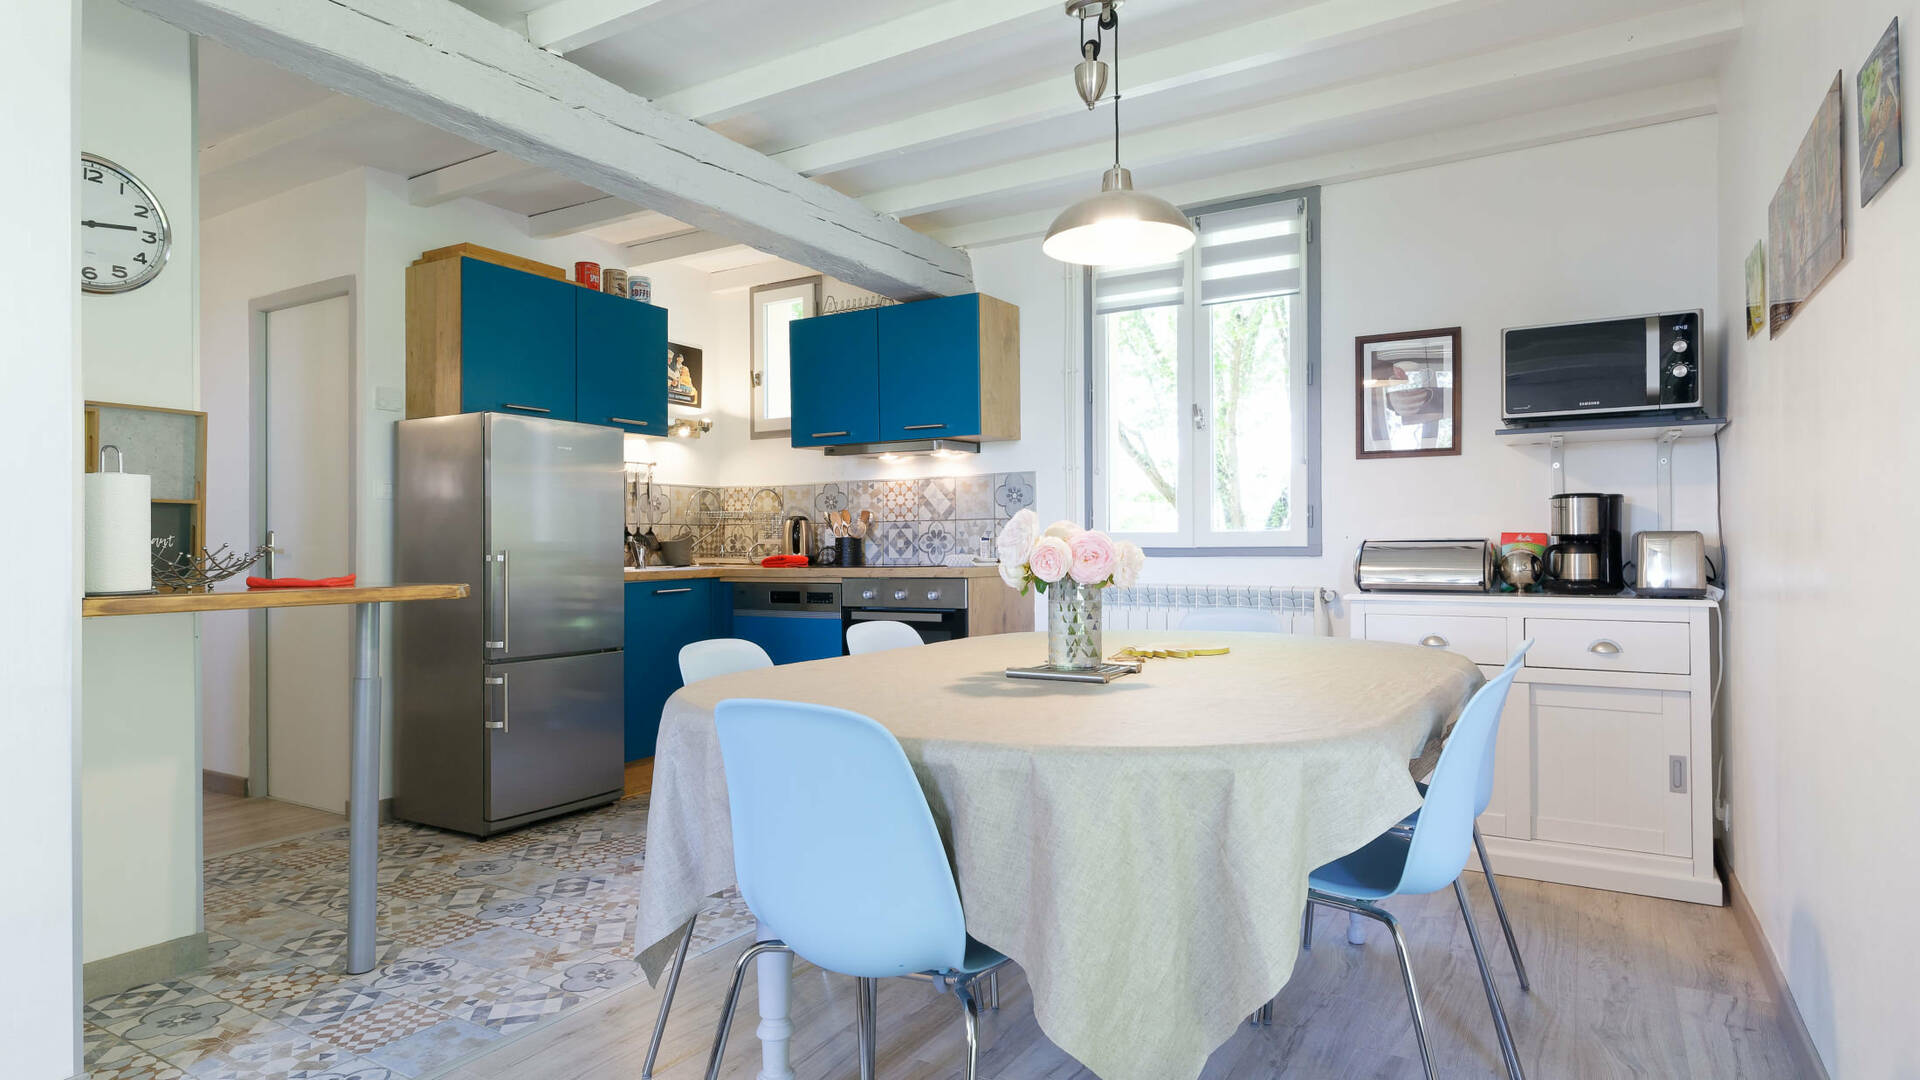 Dining Room, Gite La Maison Bleue, Savignac-Mona, Lombez, Samatan, Savès, Gascogne, Gers, France